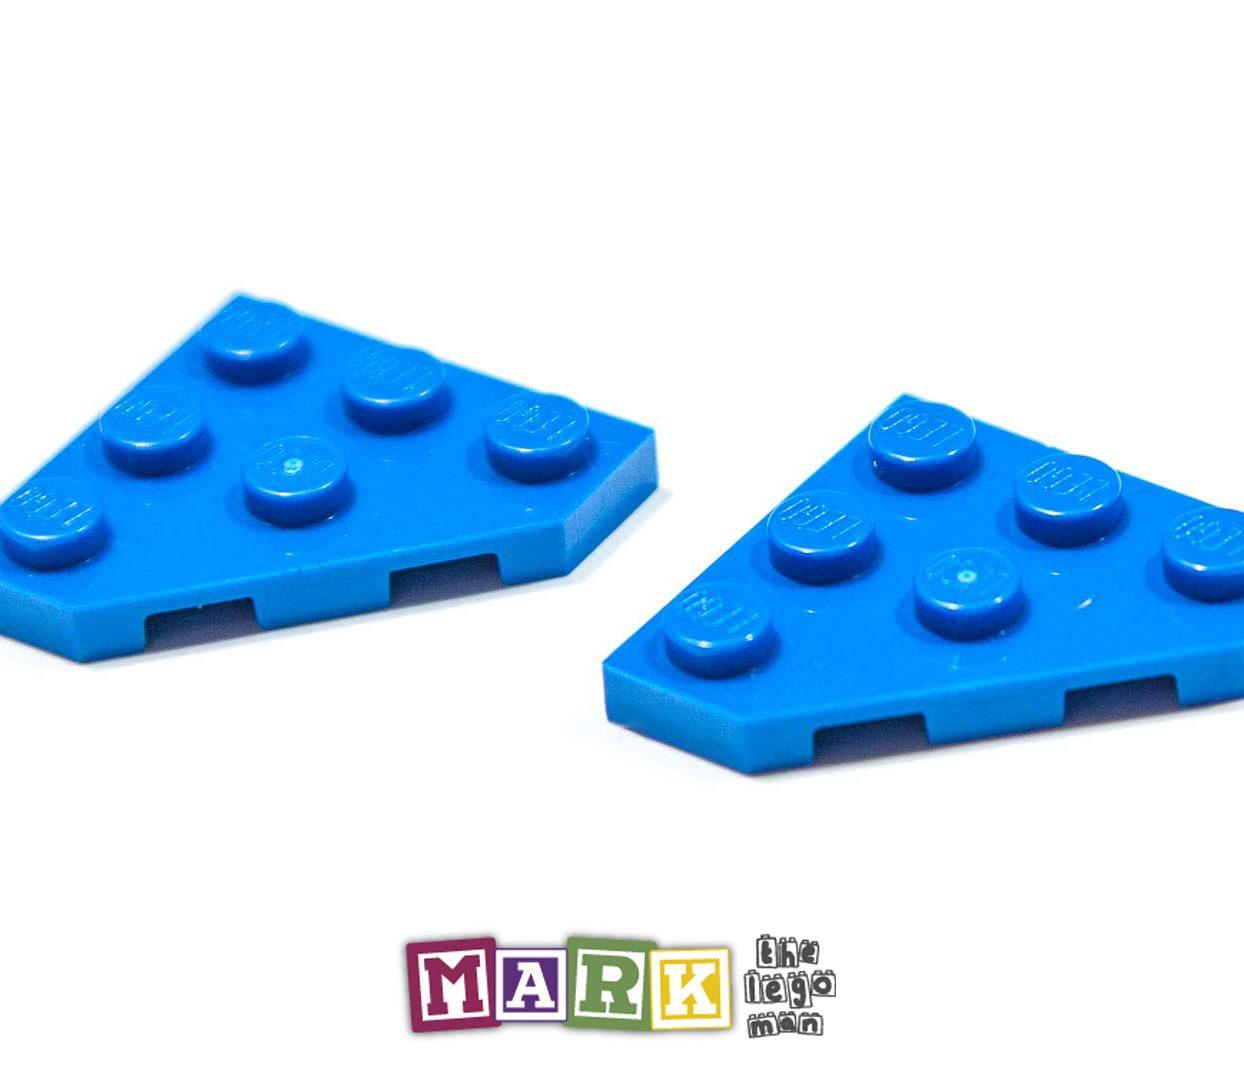 Pack of 2 New Lego 2450 3x3 45 Degree Corner Plate 4609330